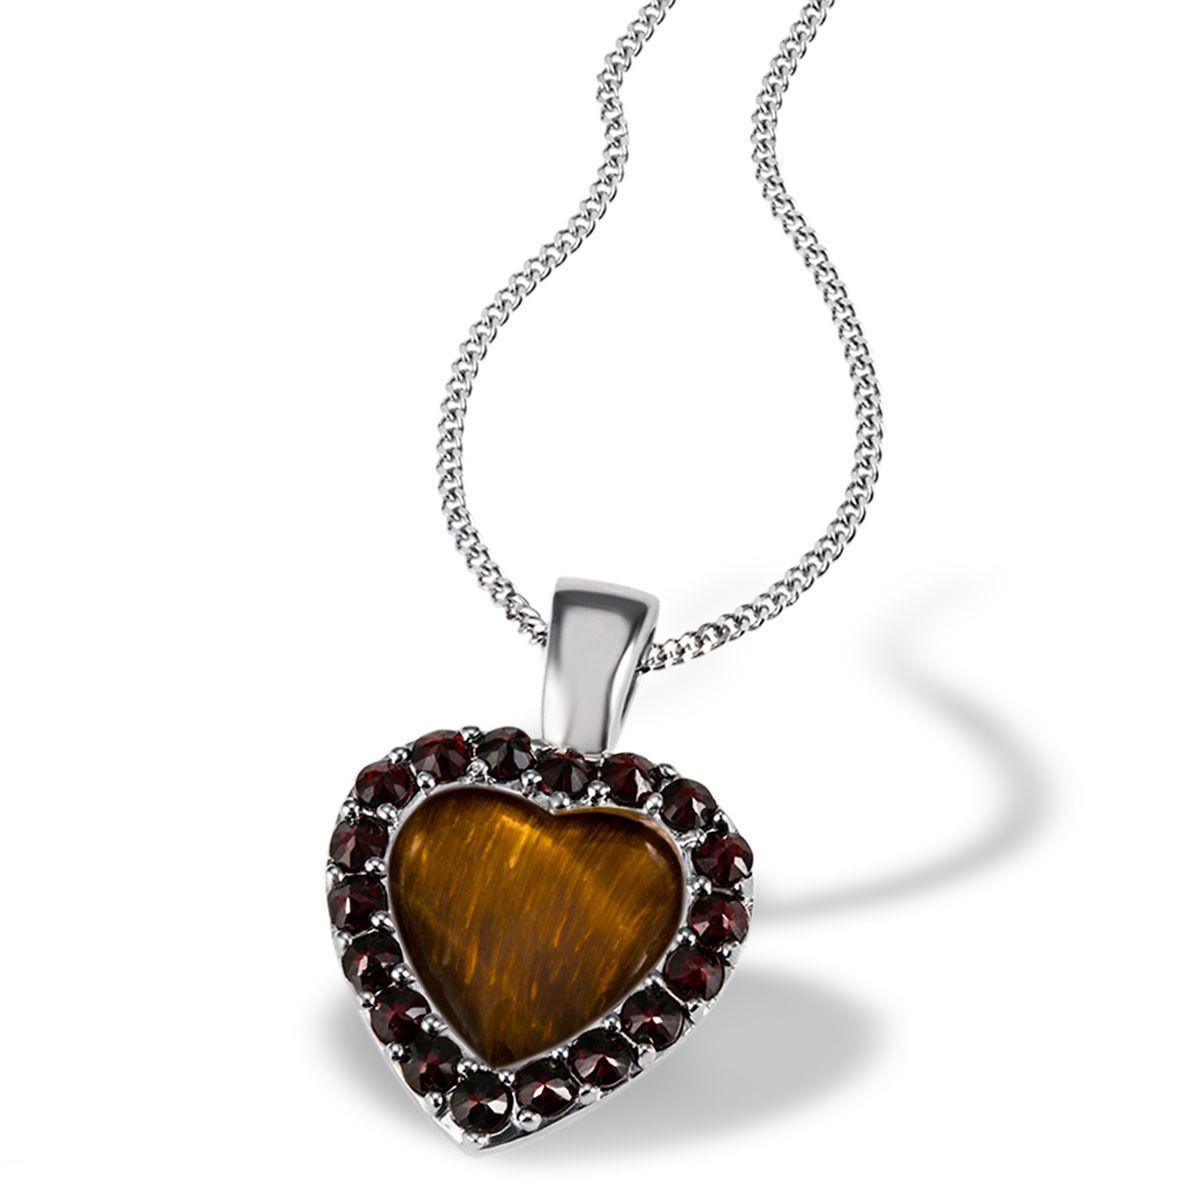 AVERDIN Averdin Collier 925/- Silber 18 Granaten rot-braun 1Tigerauge braun